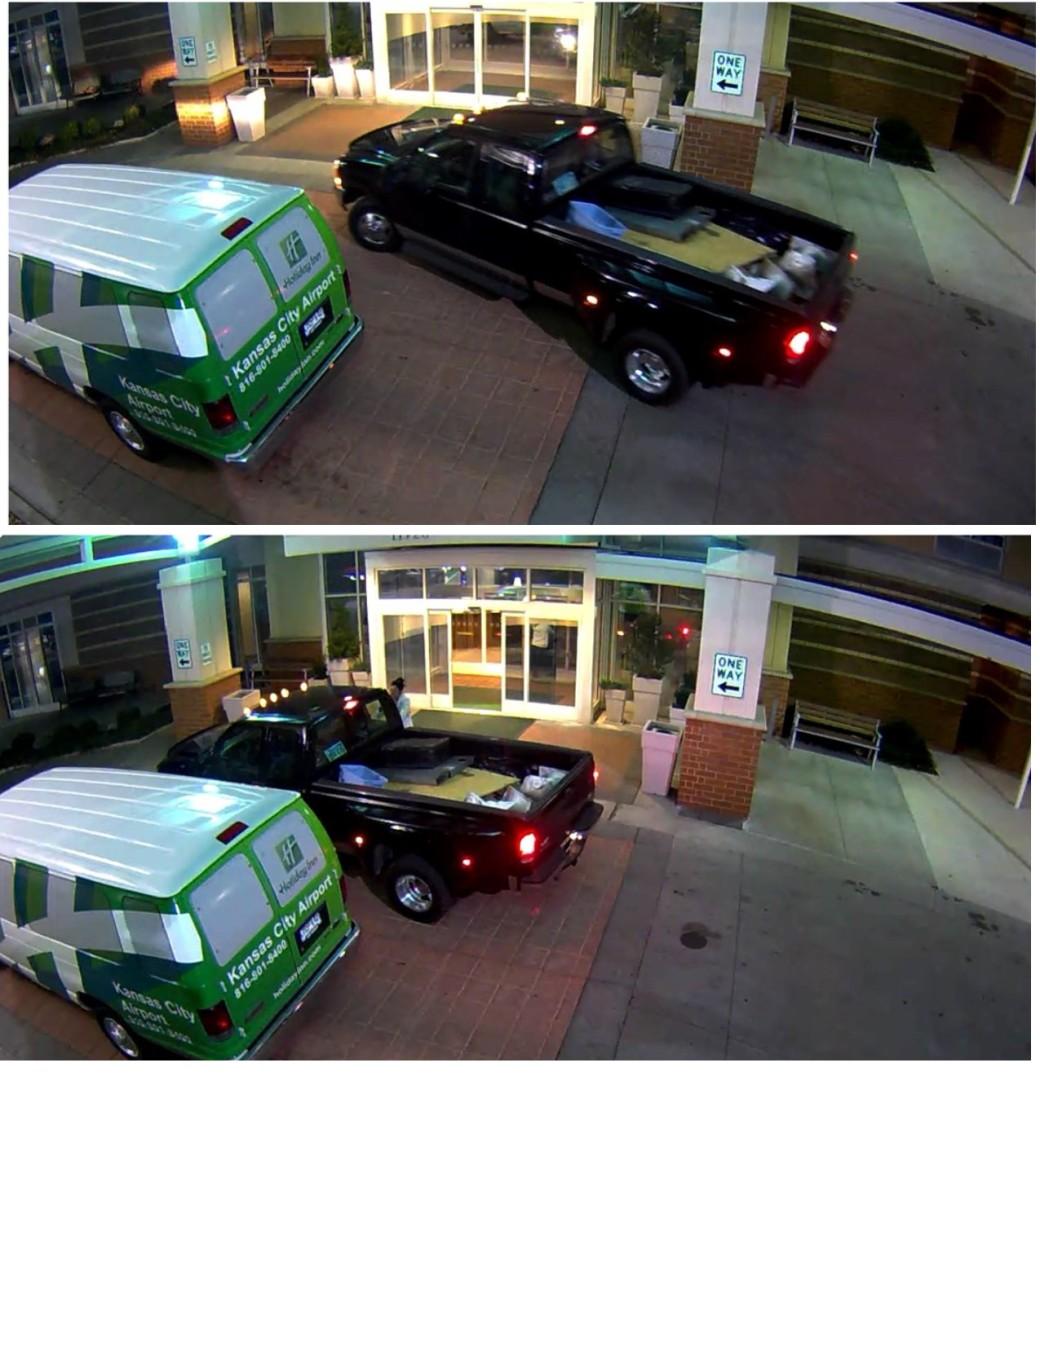 truck in theft